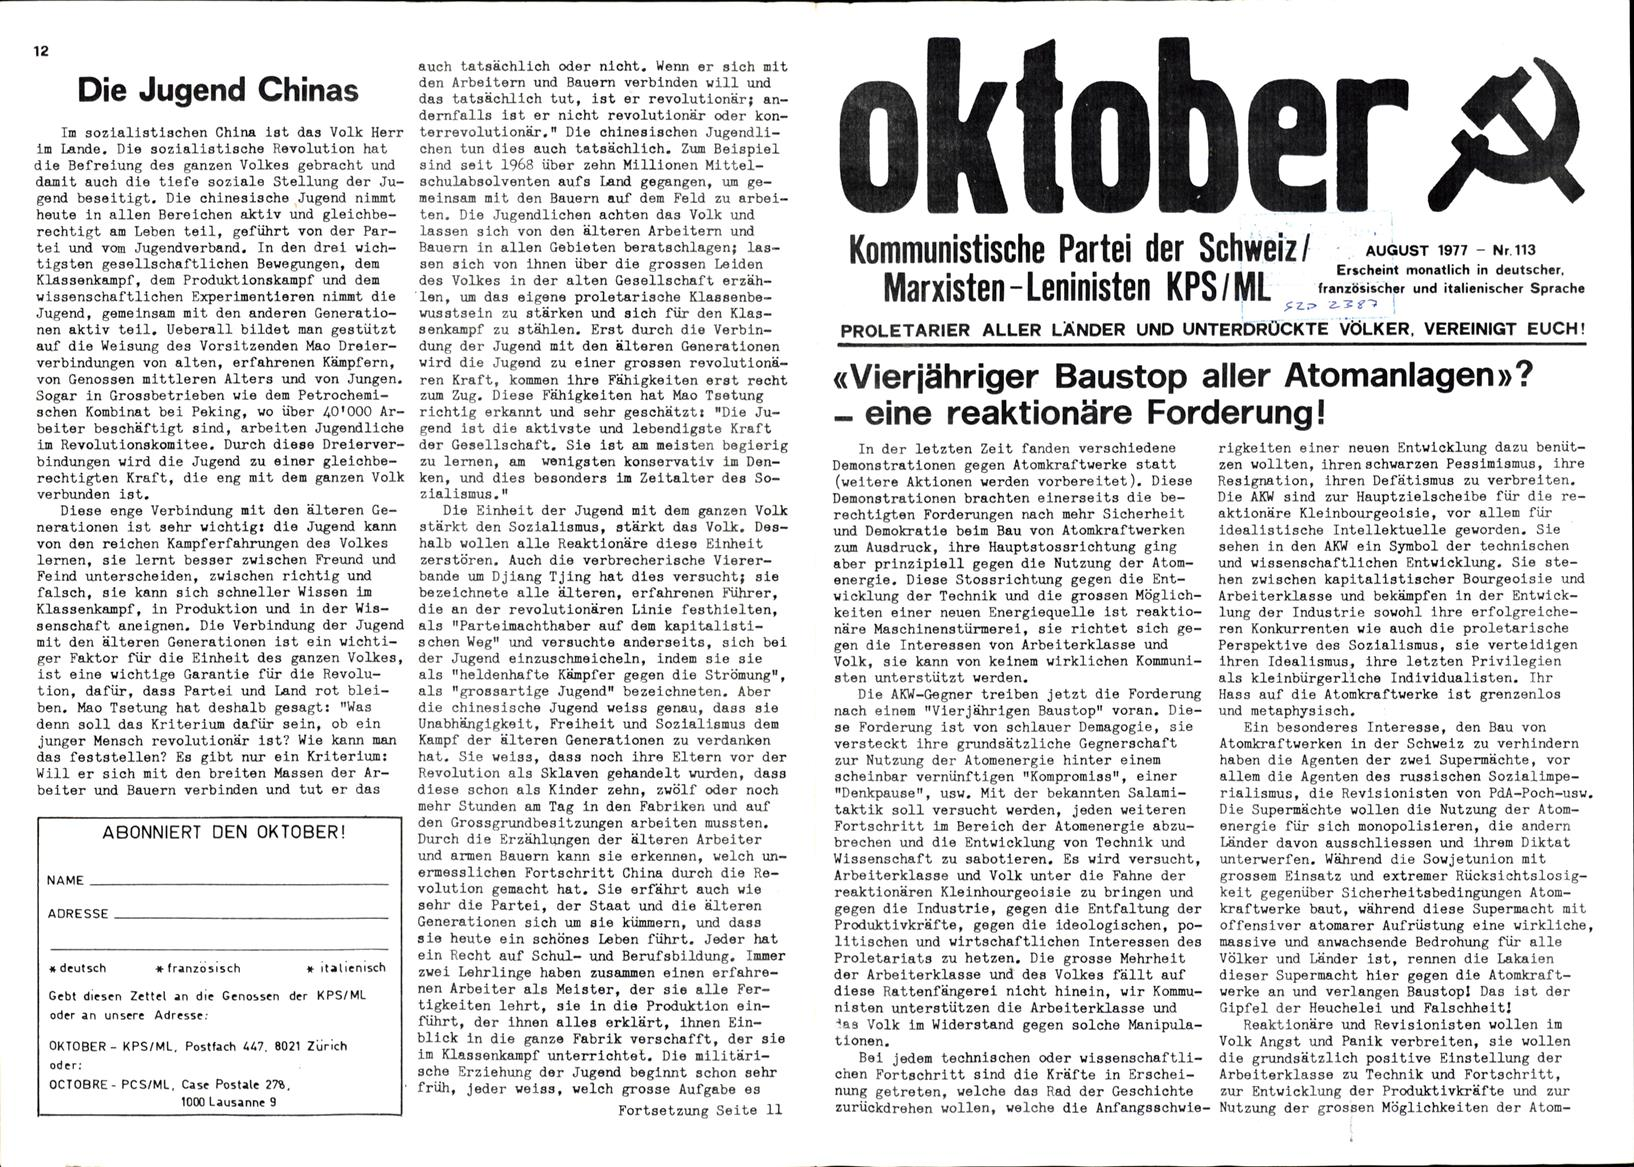 Schweiz_KPSML_Oktober_19770800_113_001